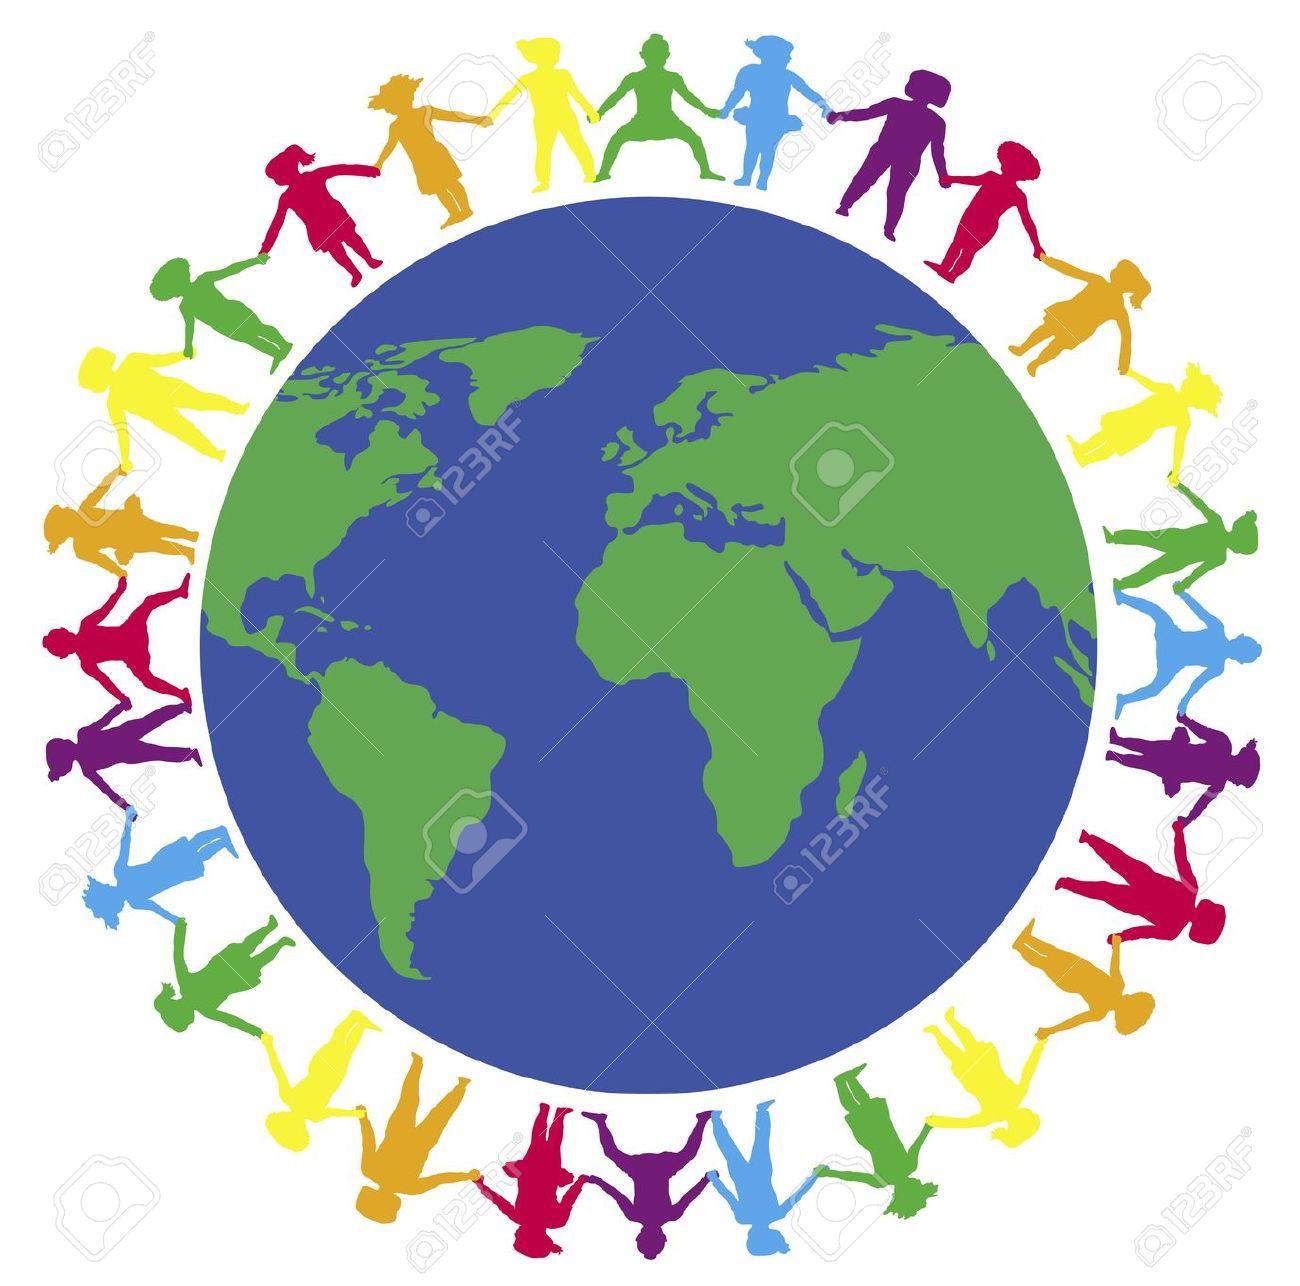 illustration of children holding hands around the world Stock Illustration - 2733244